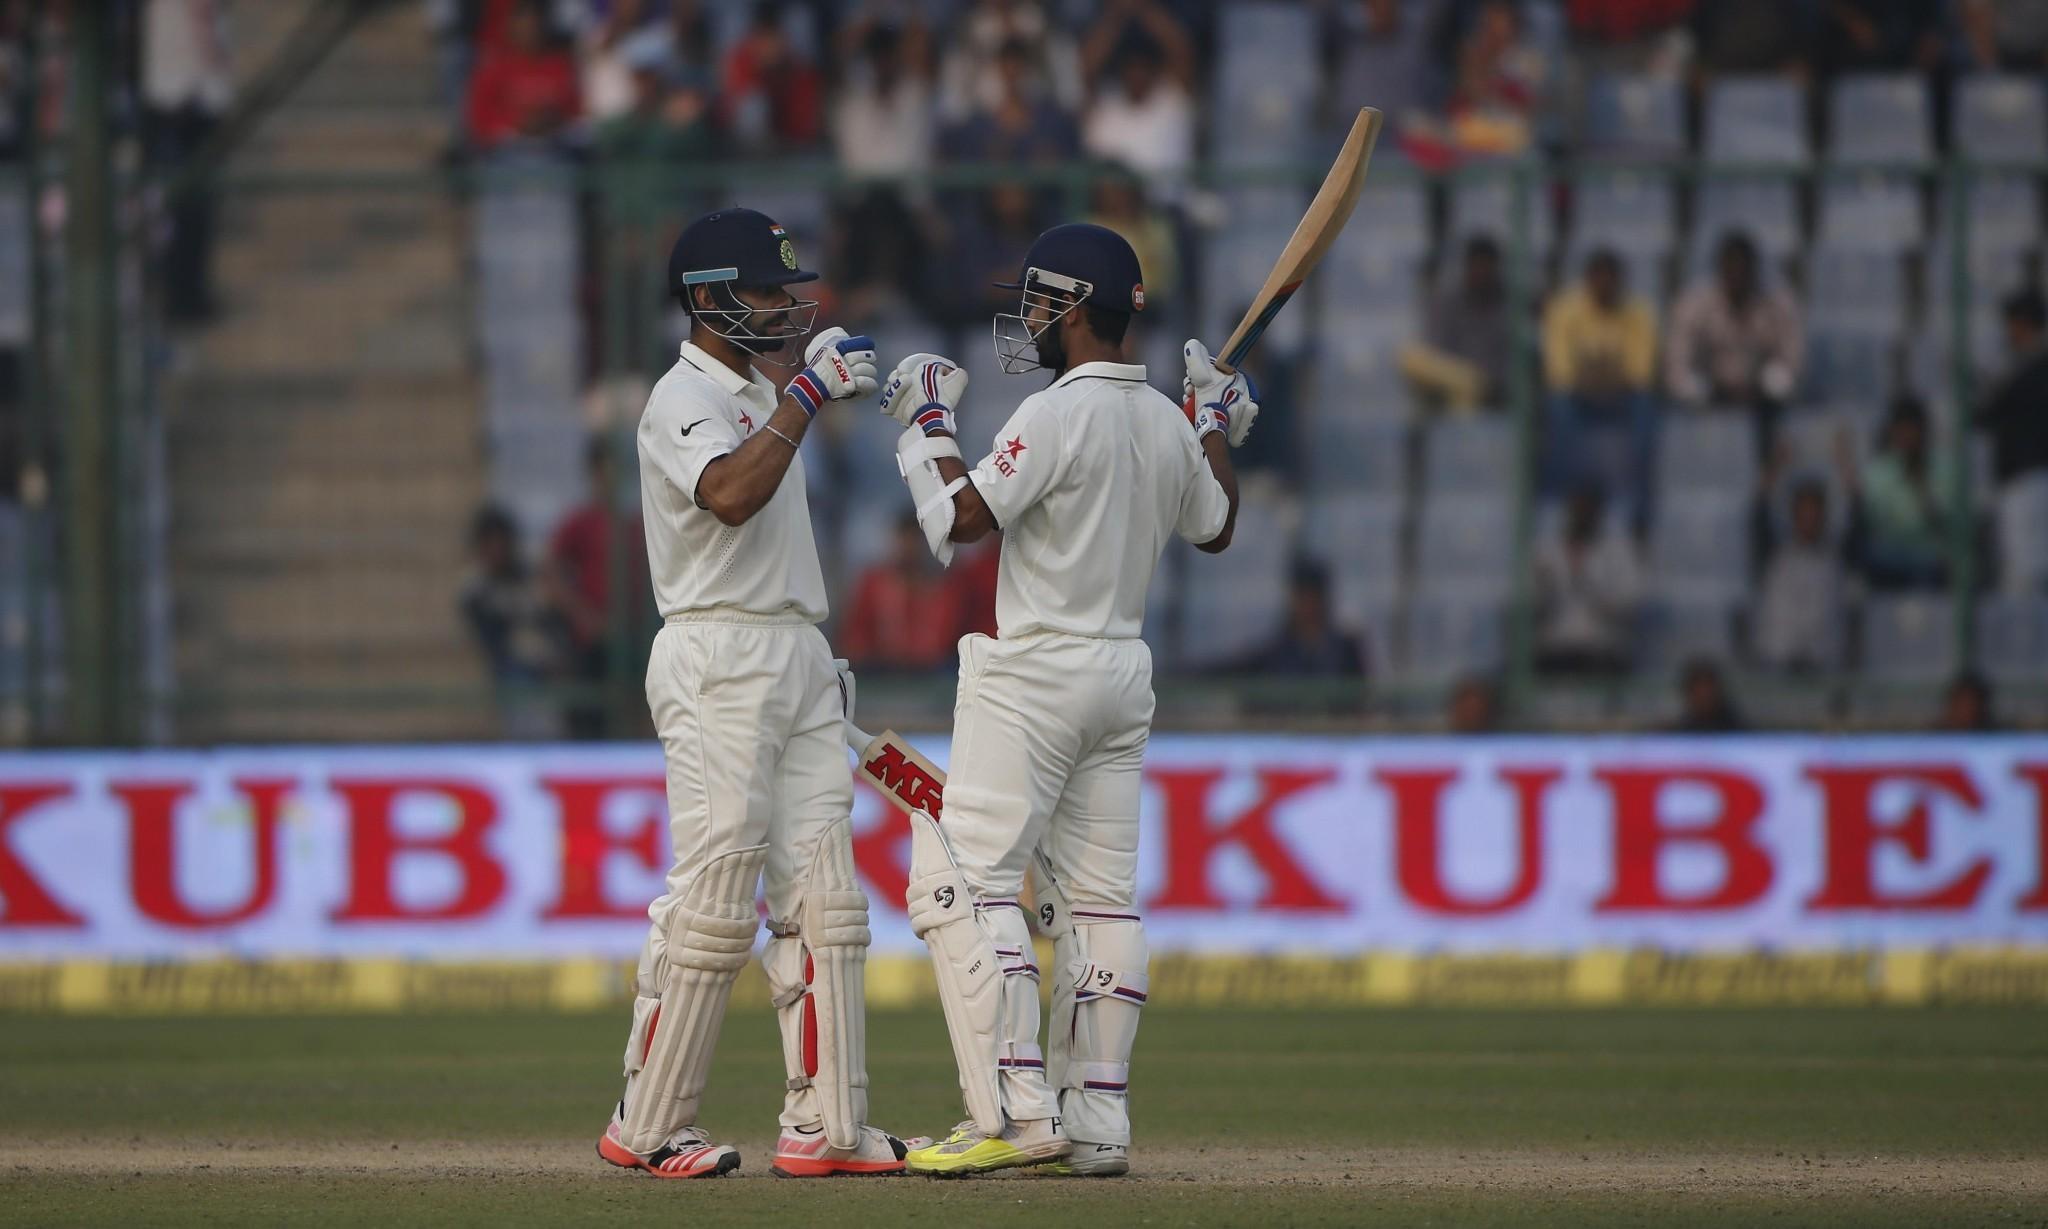 Virat Kohli puts India in control against South Africa after nervous start